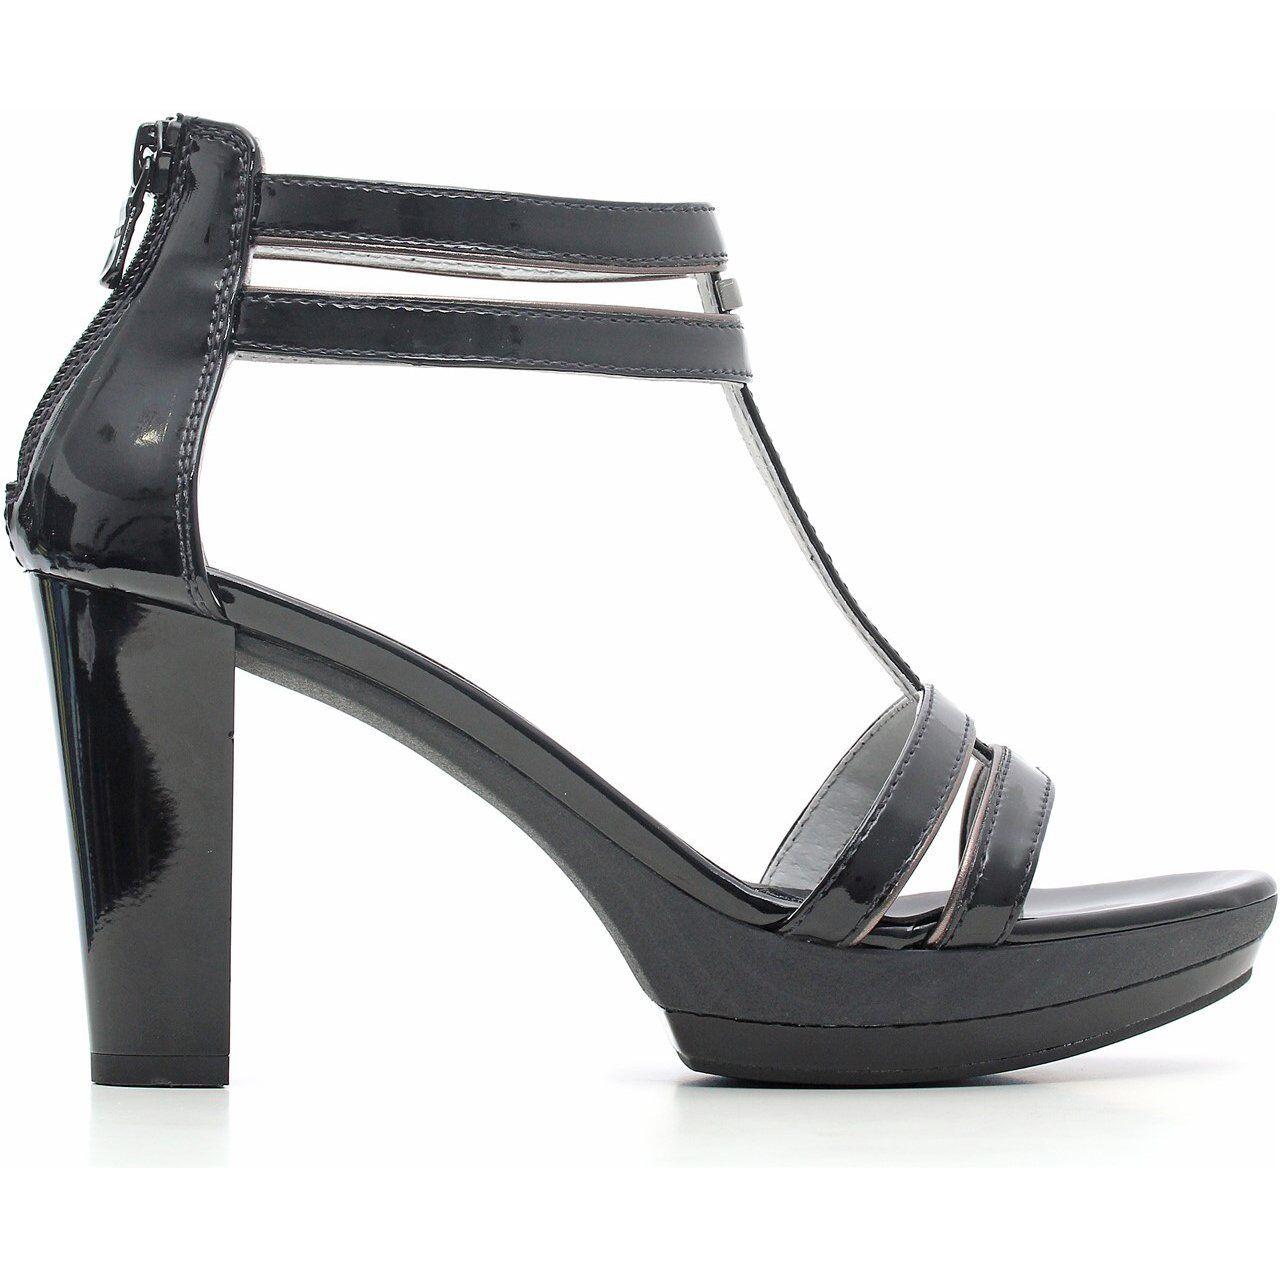 Sandalo nuova collezione negroGiardini P615512D bianco o negro negro negro tacco e plateau  calidad oficial